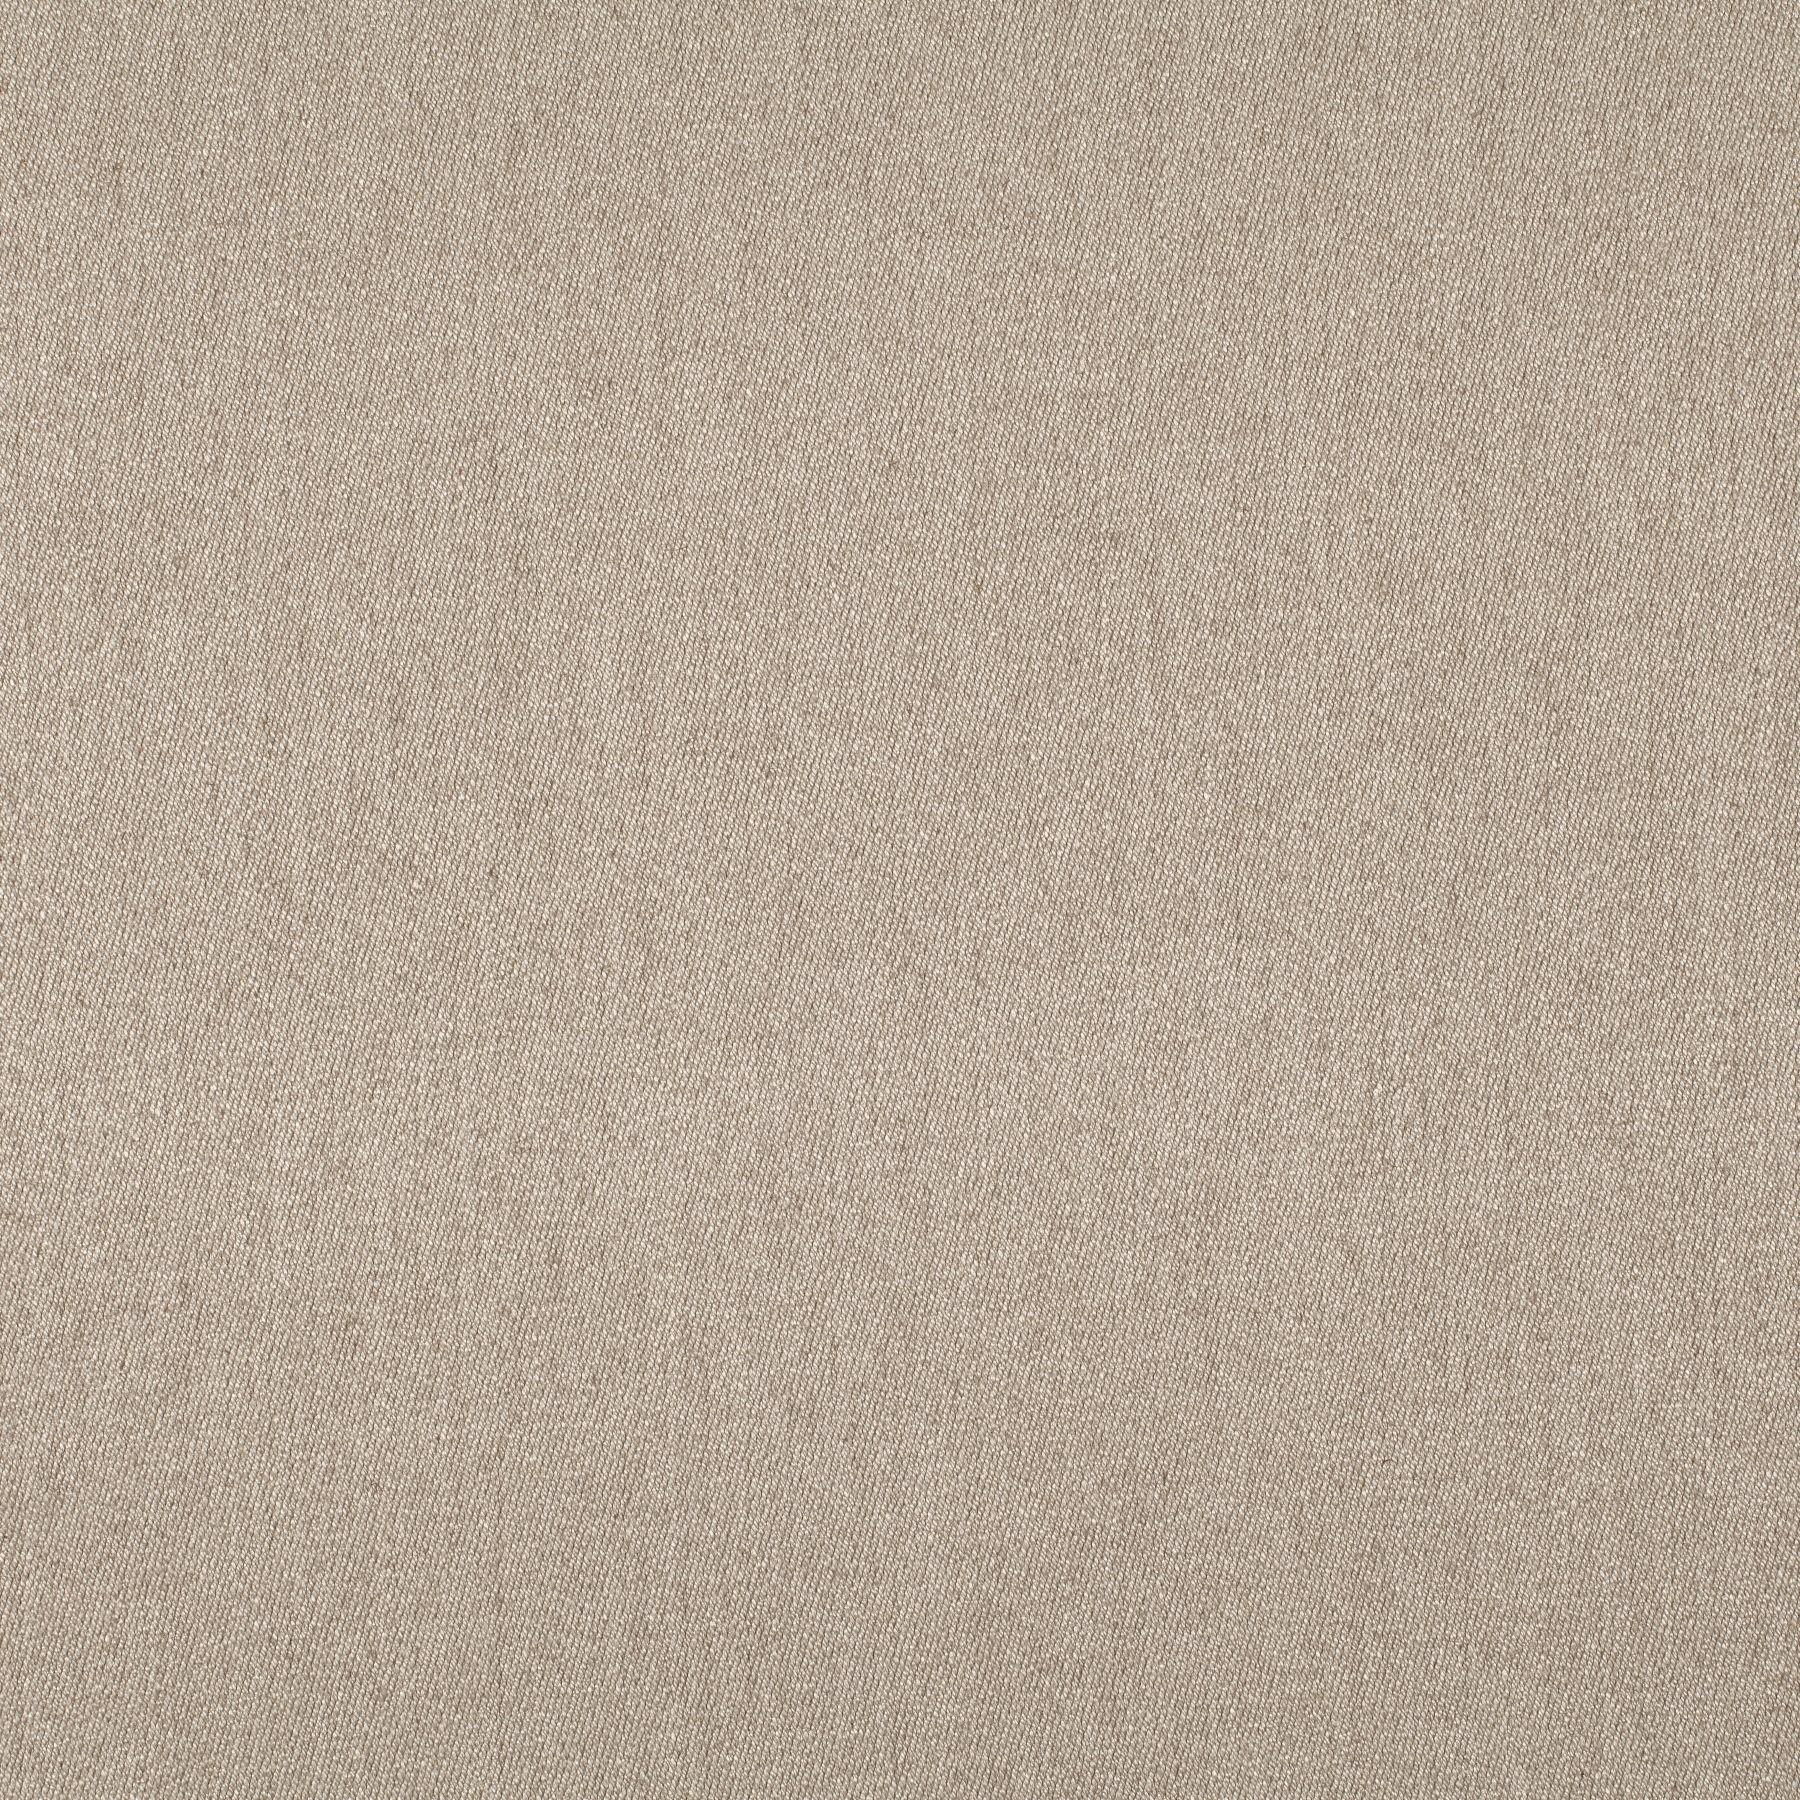 Upholstery Fabric CASANOVA 1 1340 020